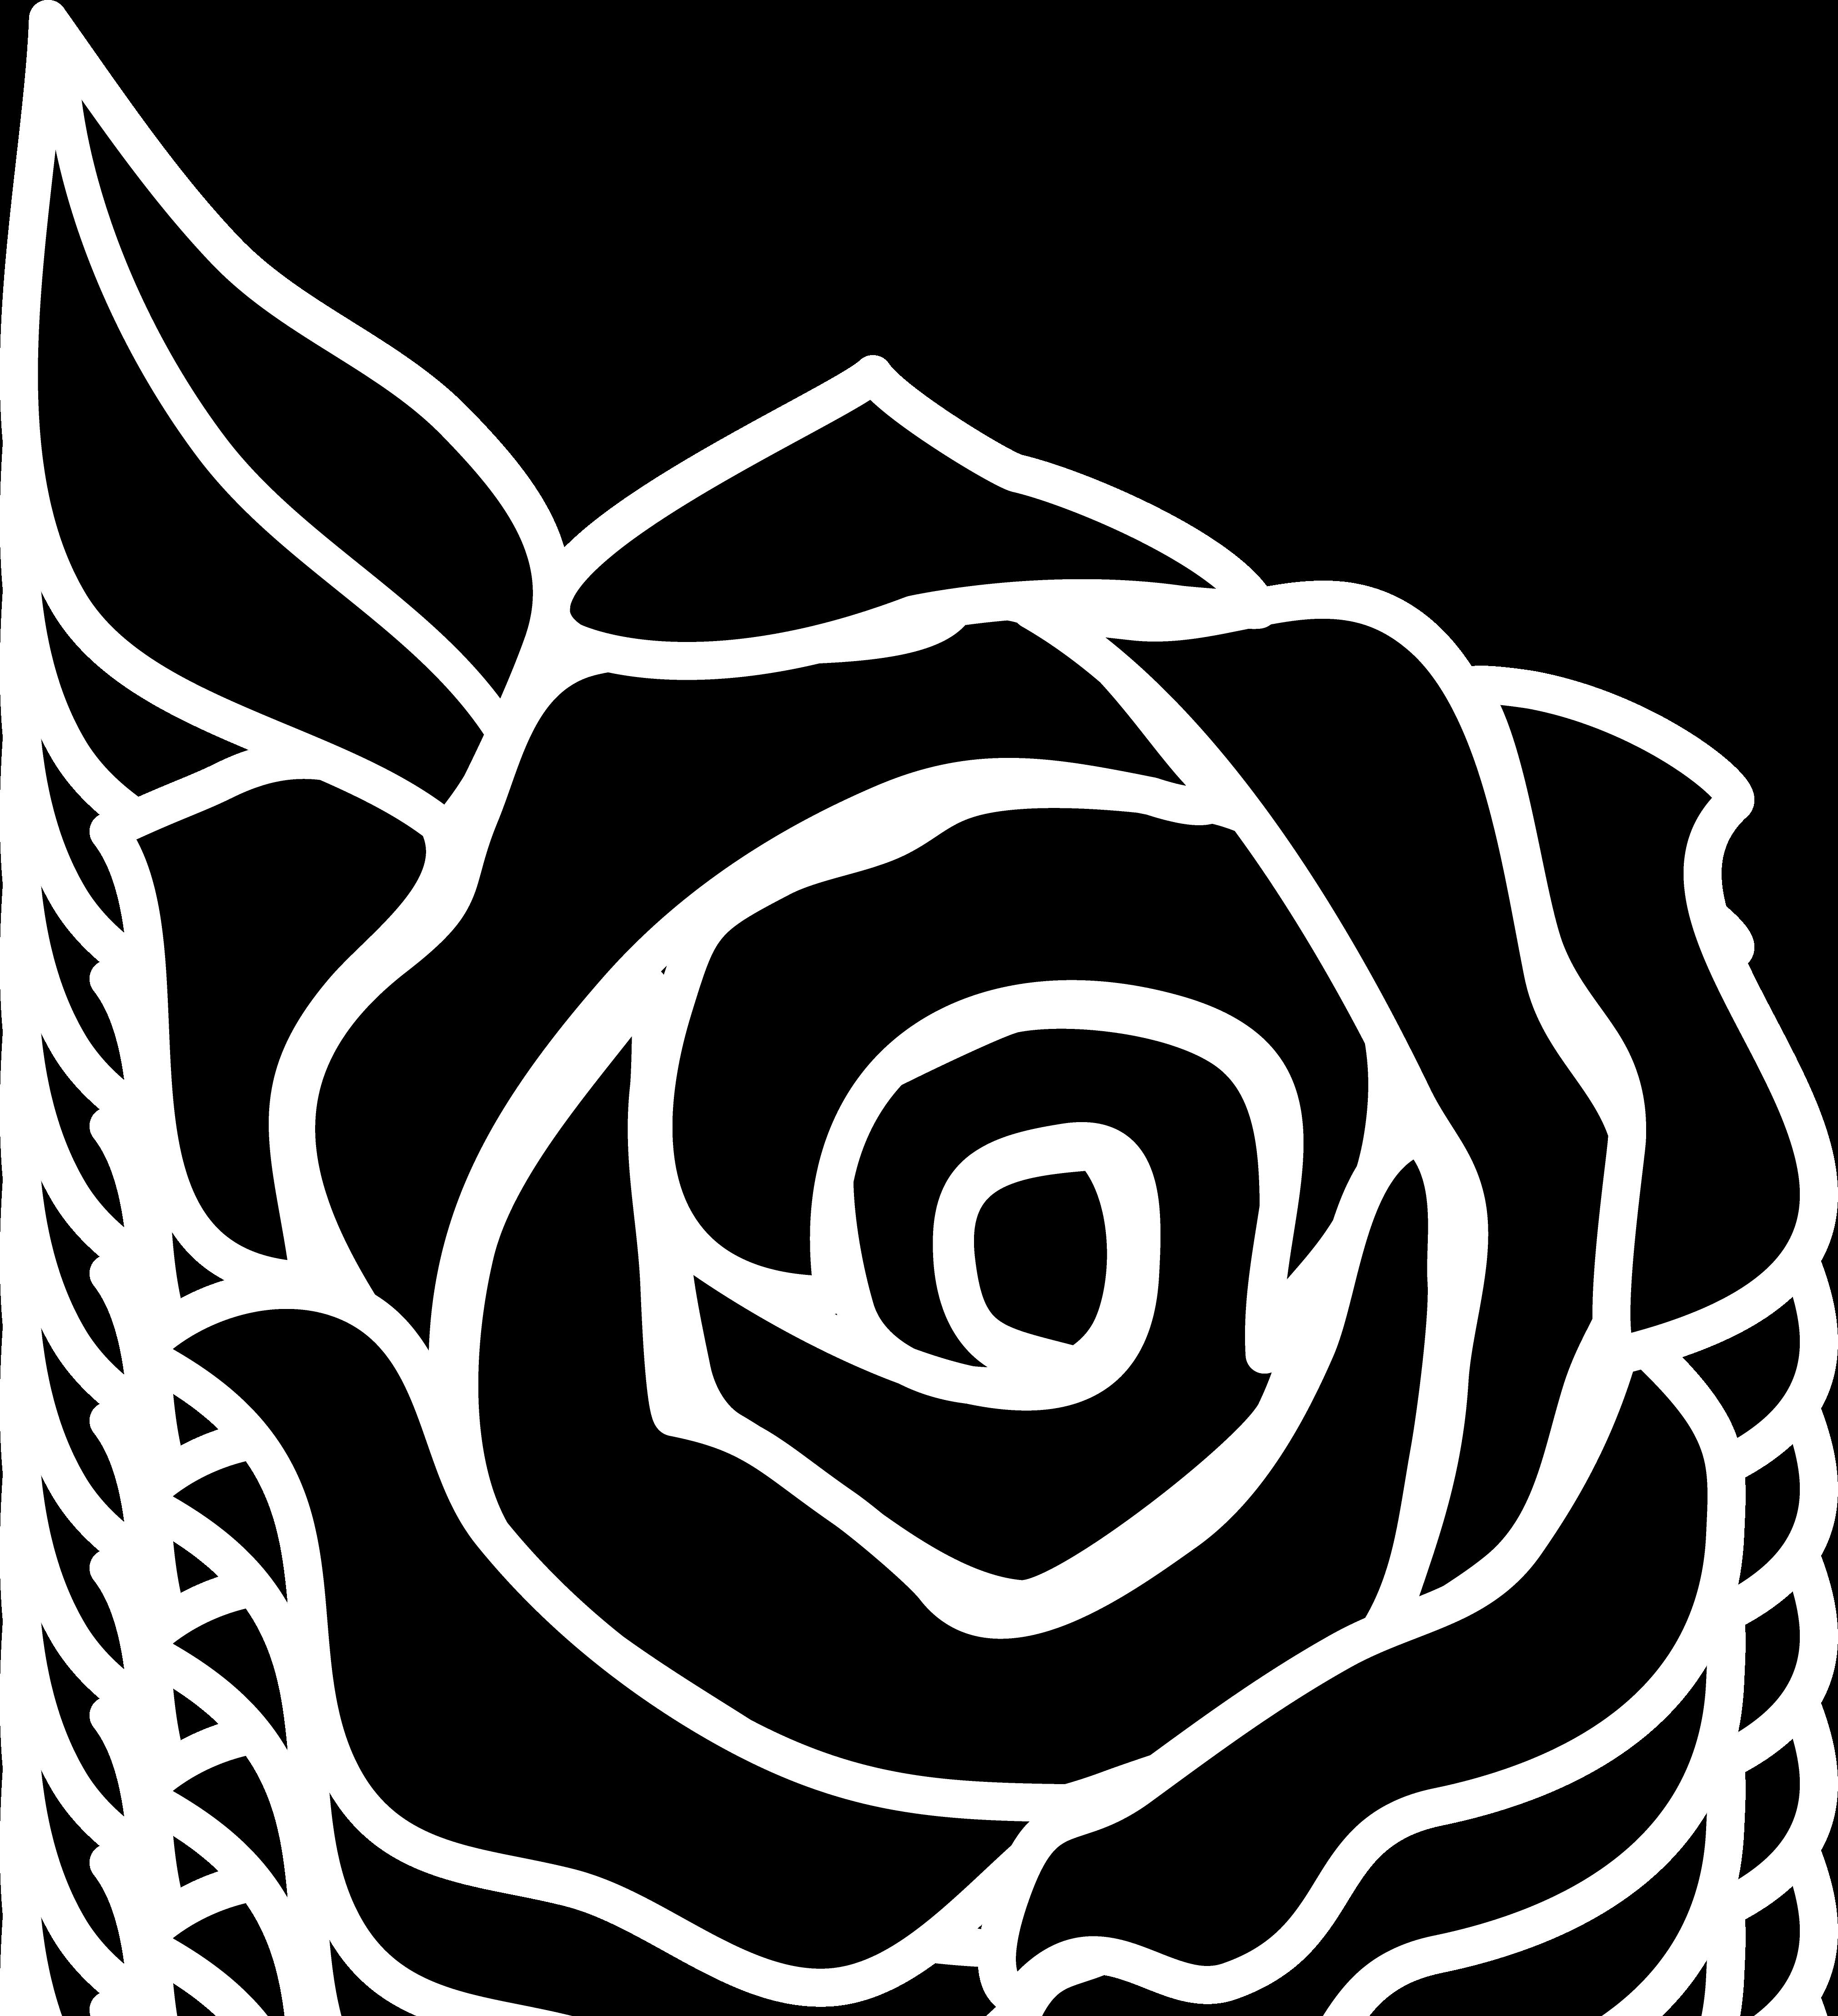 Horseshoe and rose vinyl. Flower clipart silhouette